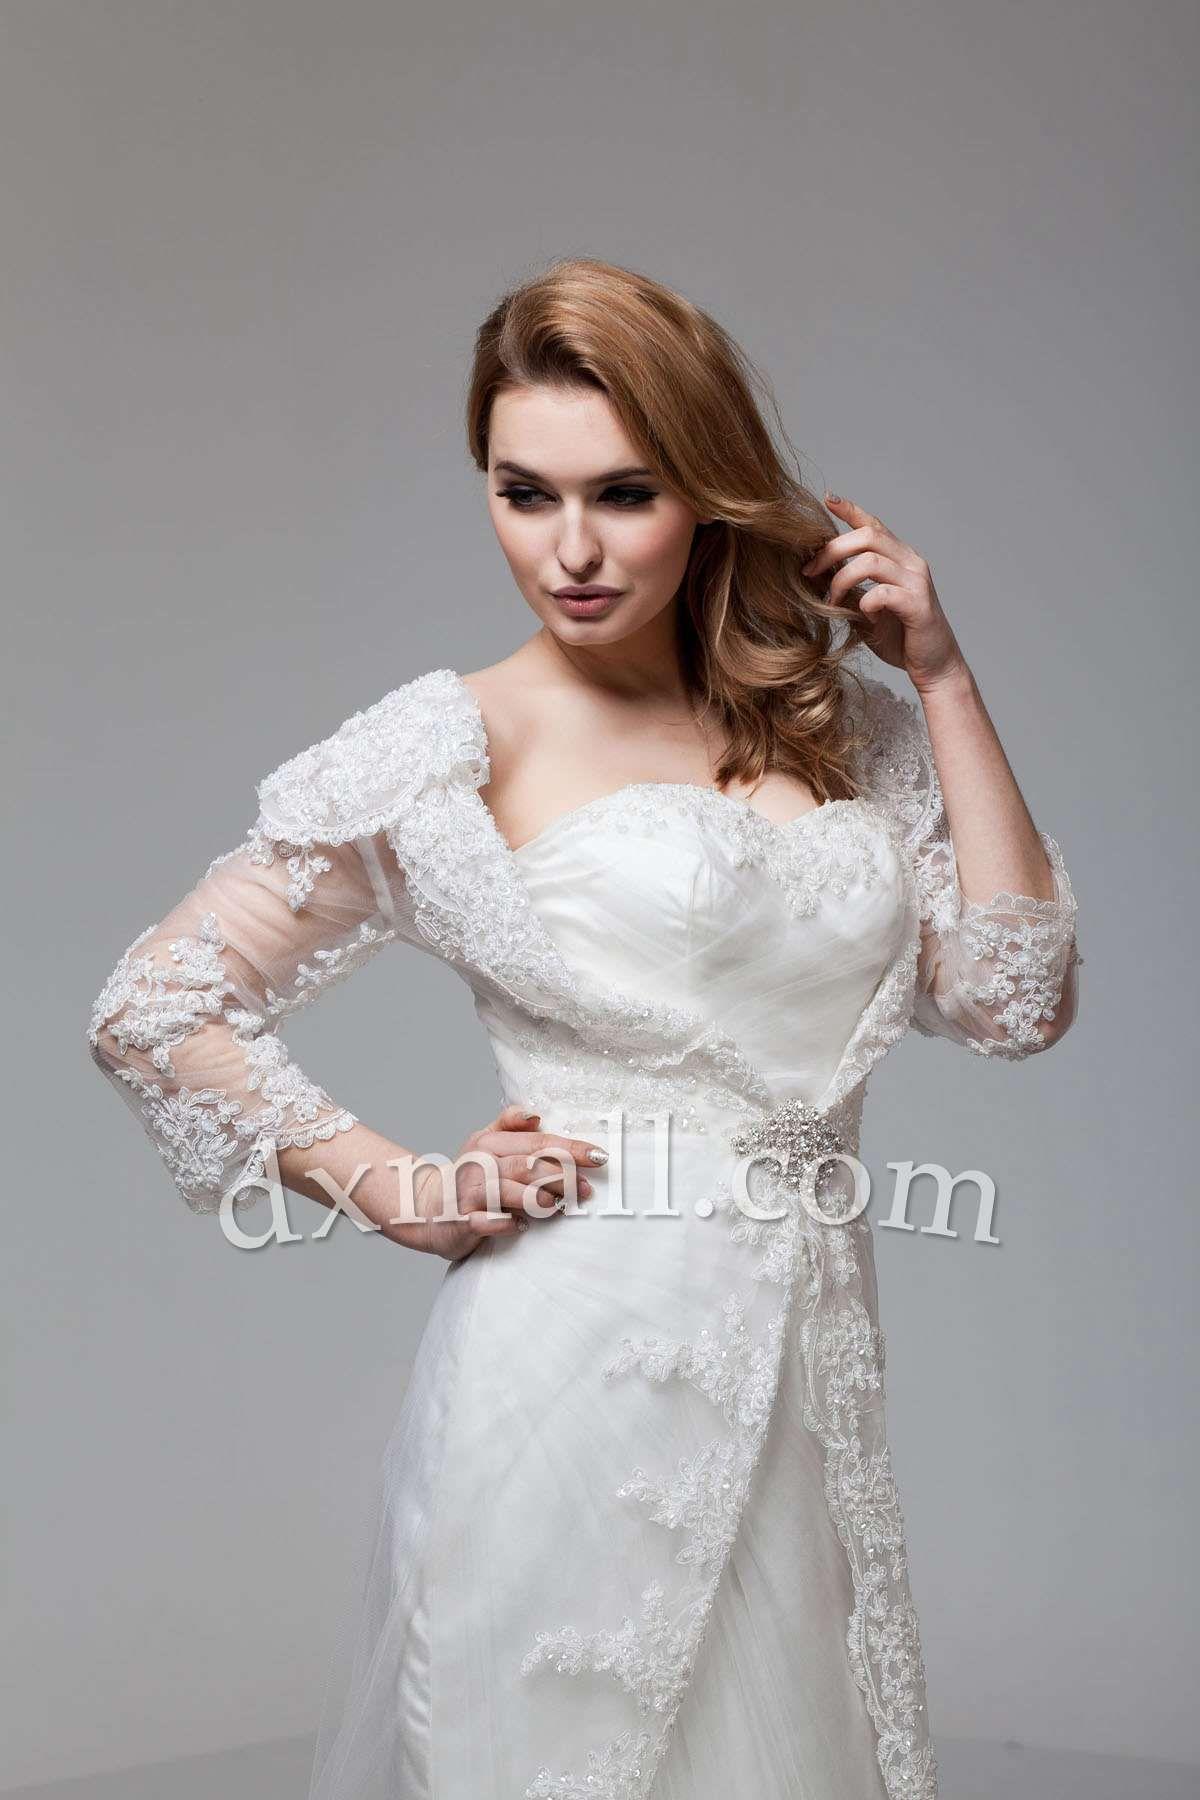 Sheath/Column Wedding Dresses Sweetheart Court Train Lace